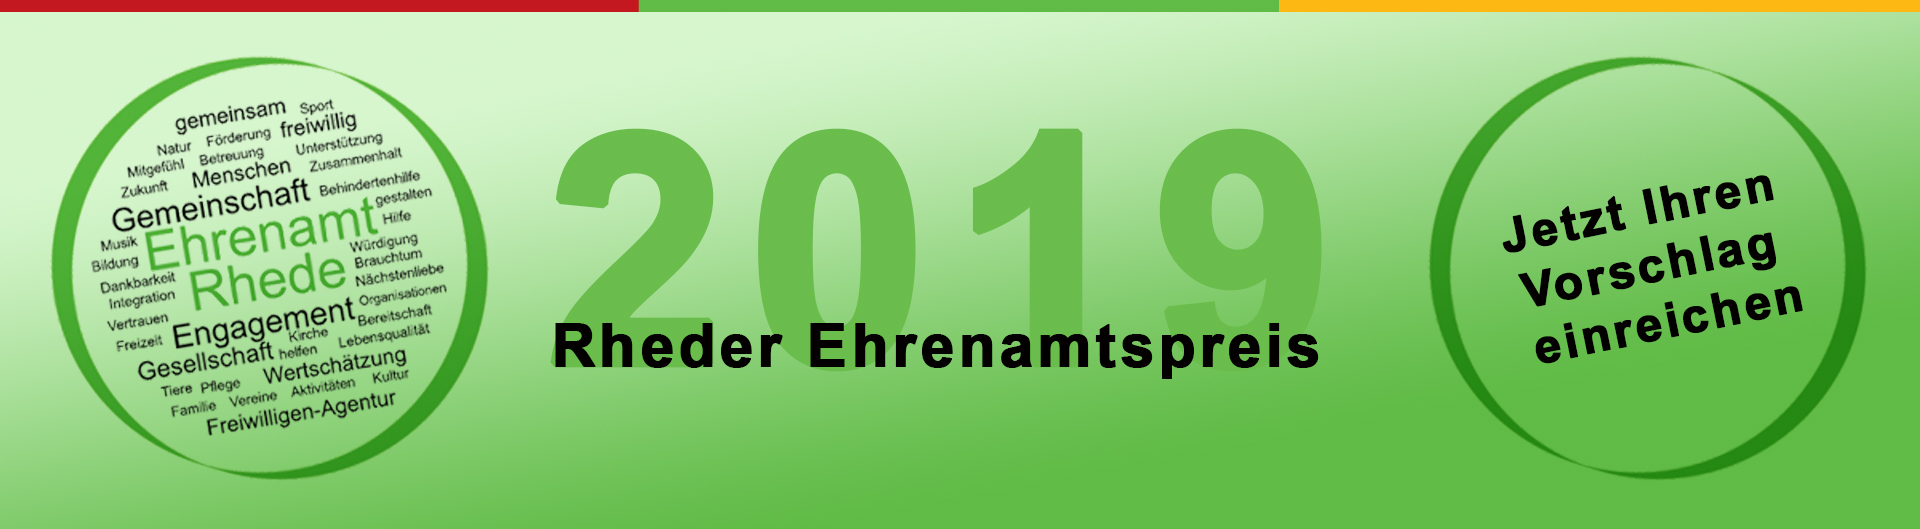 Rheder Ehrenamtspreis 2019